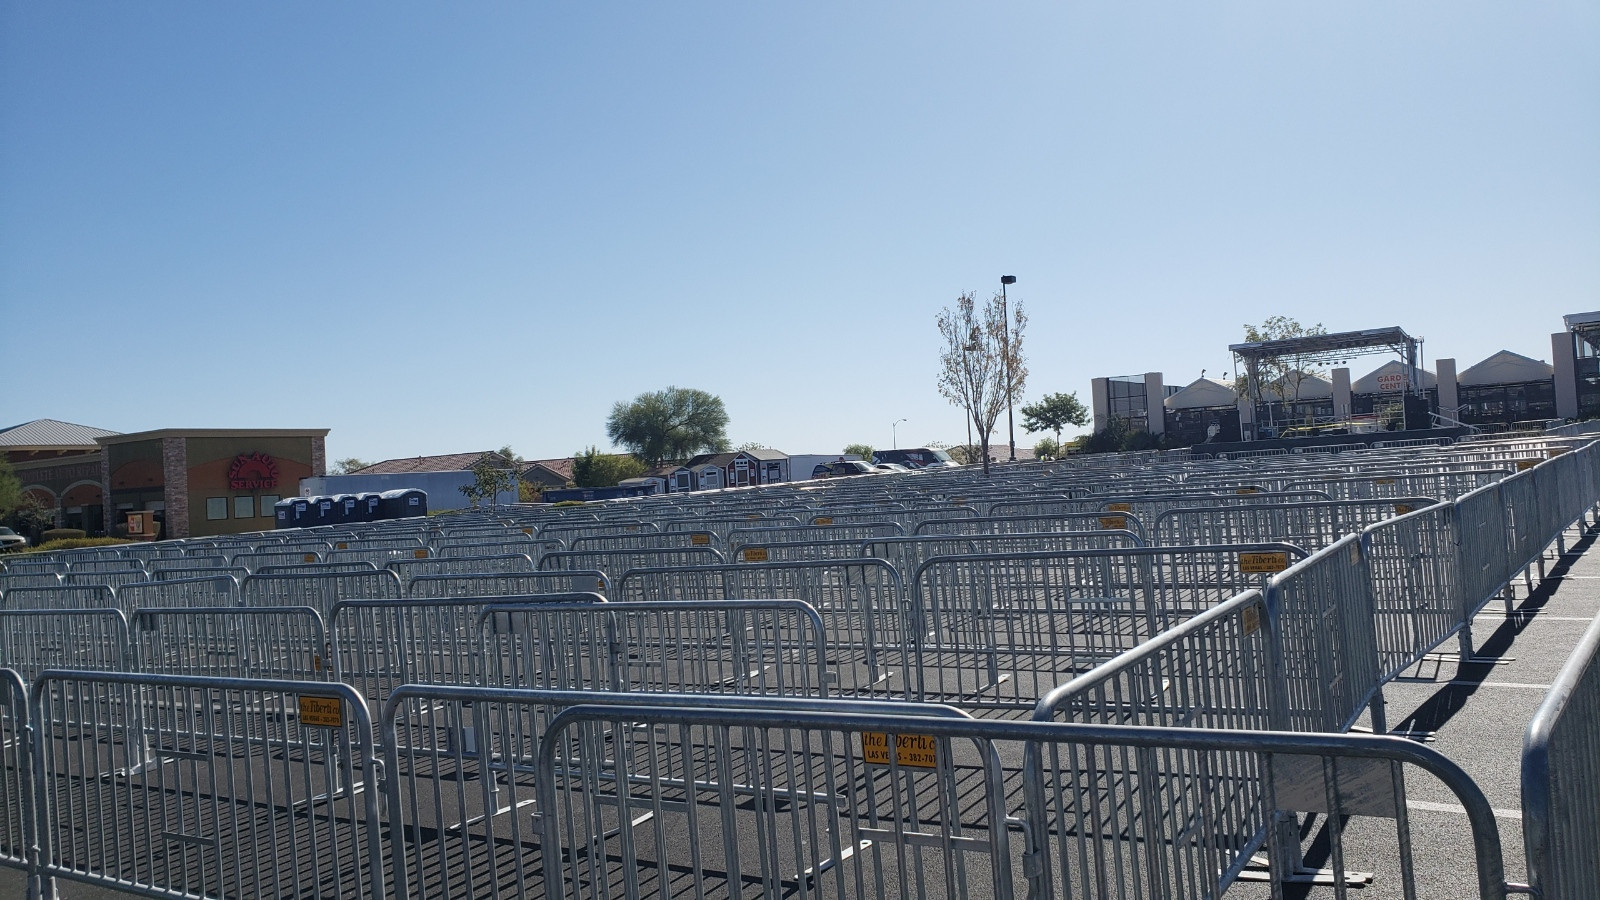 NLVPD Safe Halloween 2019 - The Tiberti Fence Company - Las Vegas, Nevada